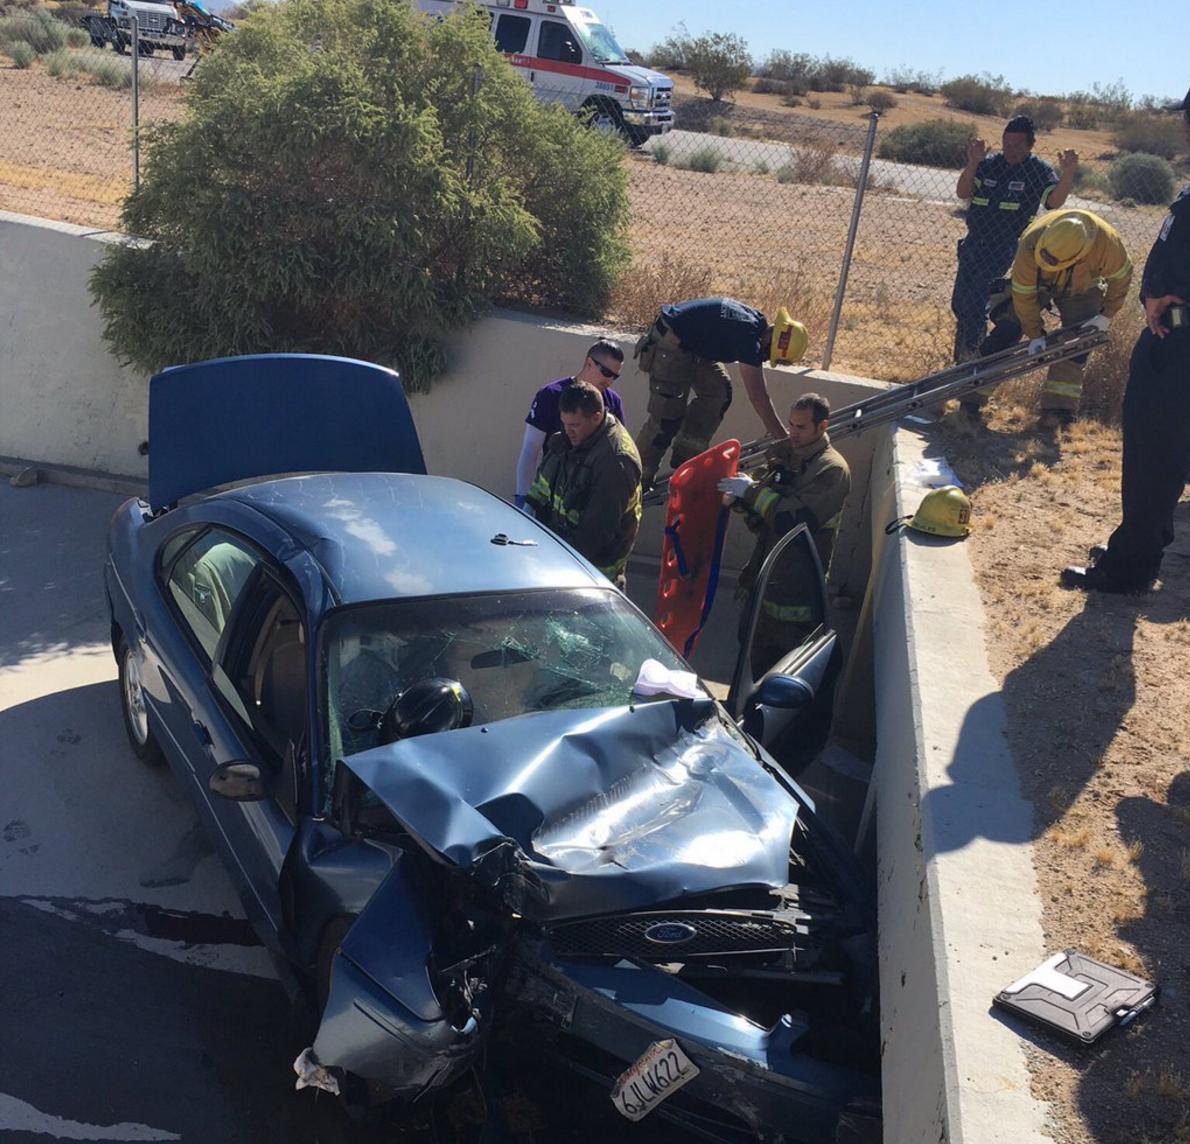 Photo Courtesy of San Bernardino County Fire Department